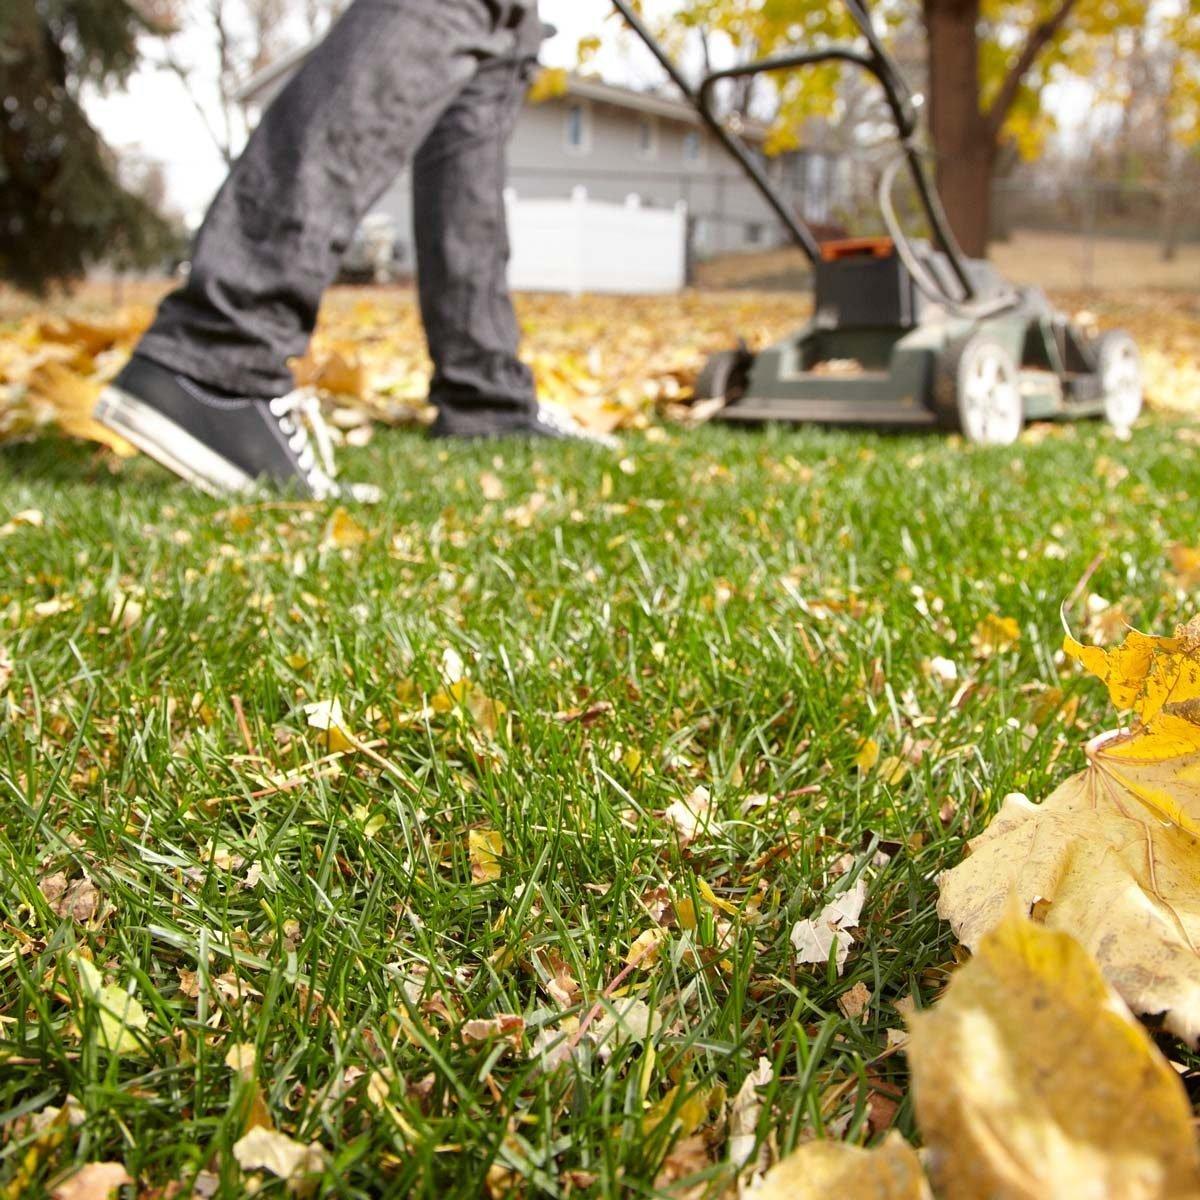 The Best Fall Lawn & Garden Tips